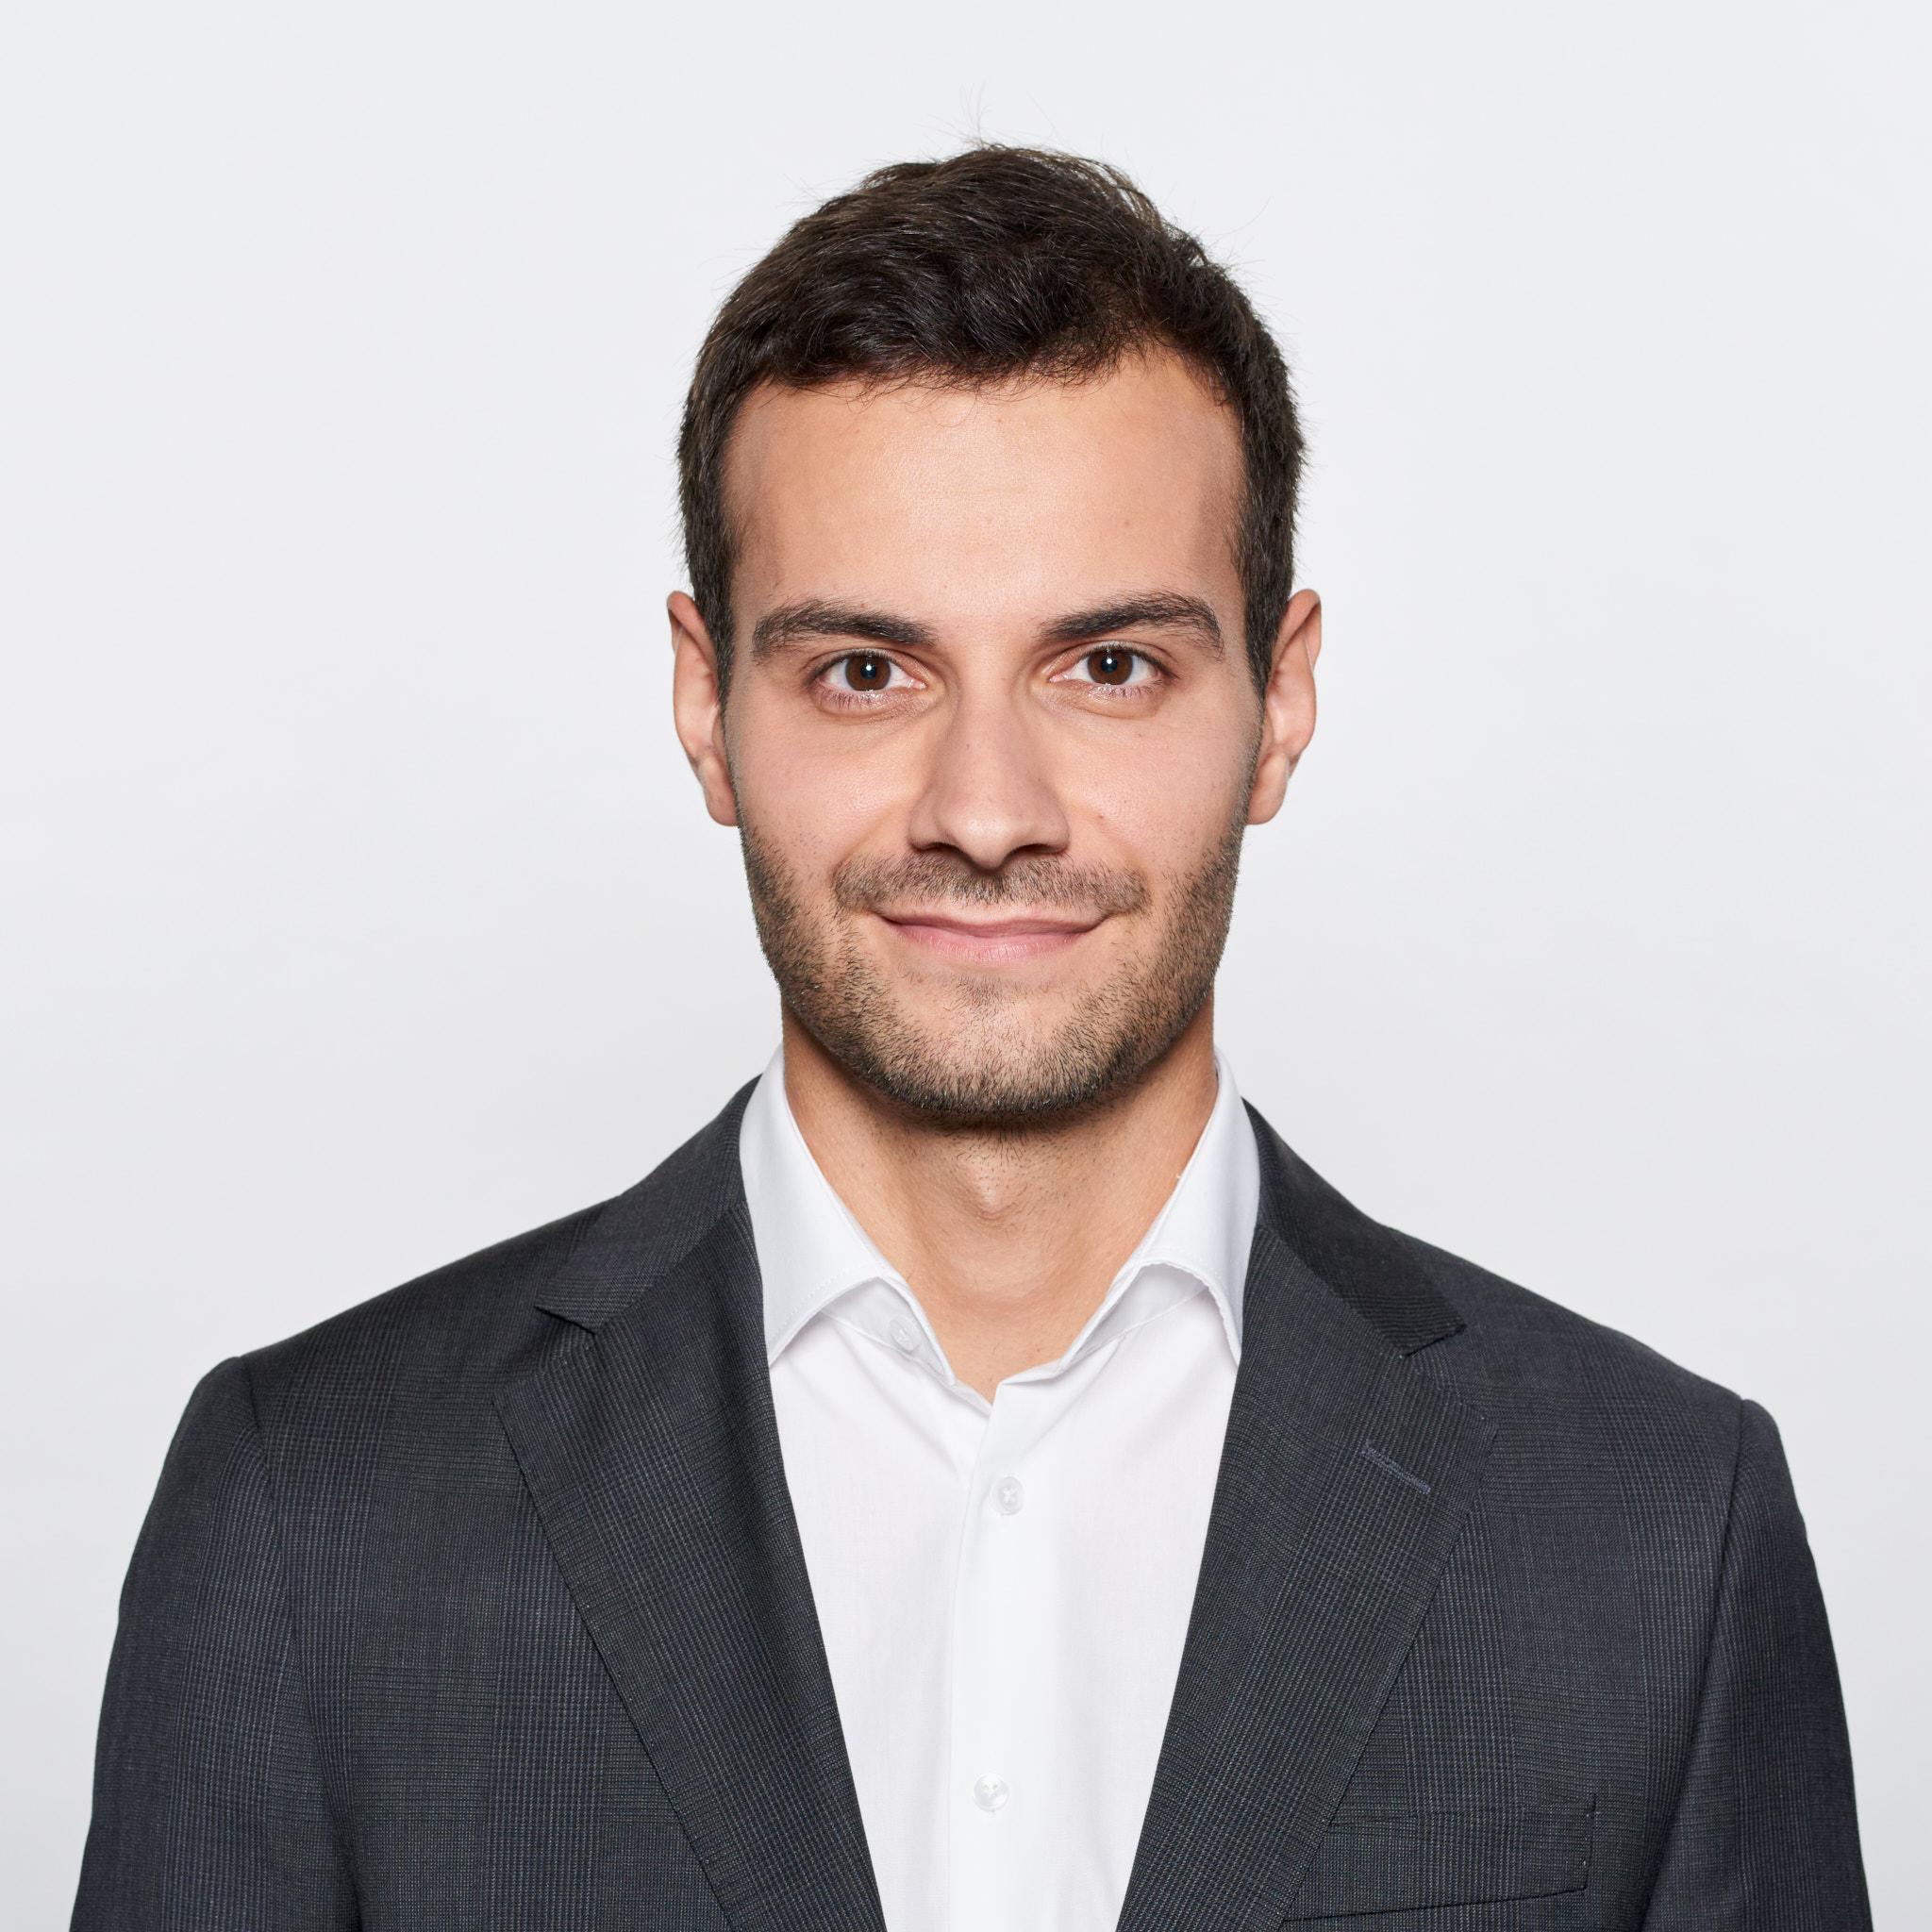 Daniel Mahlow, co-founder of Contiamo